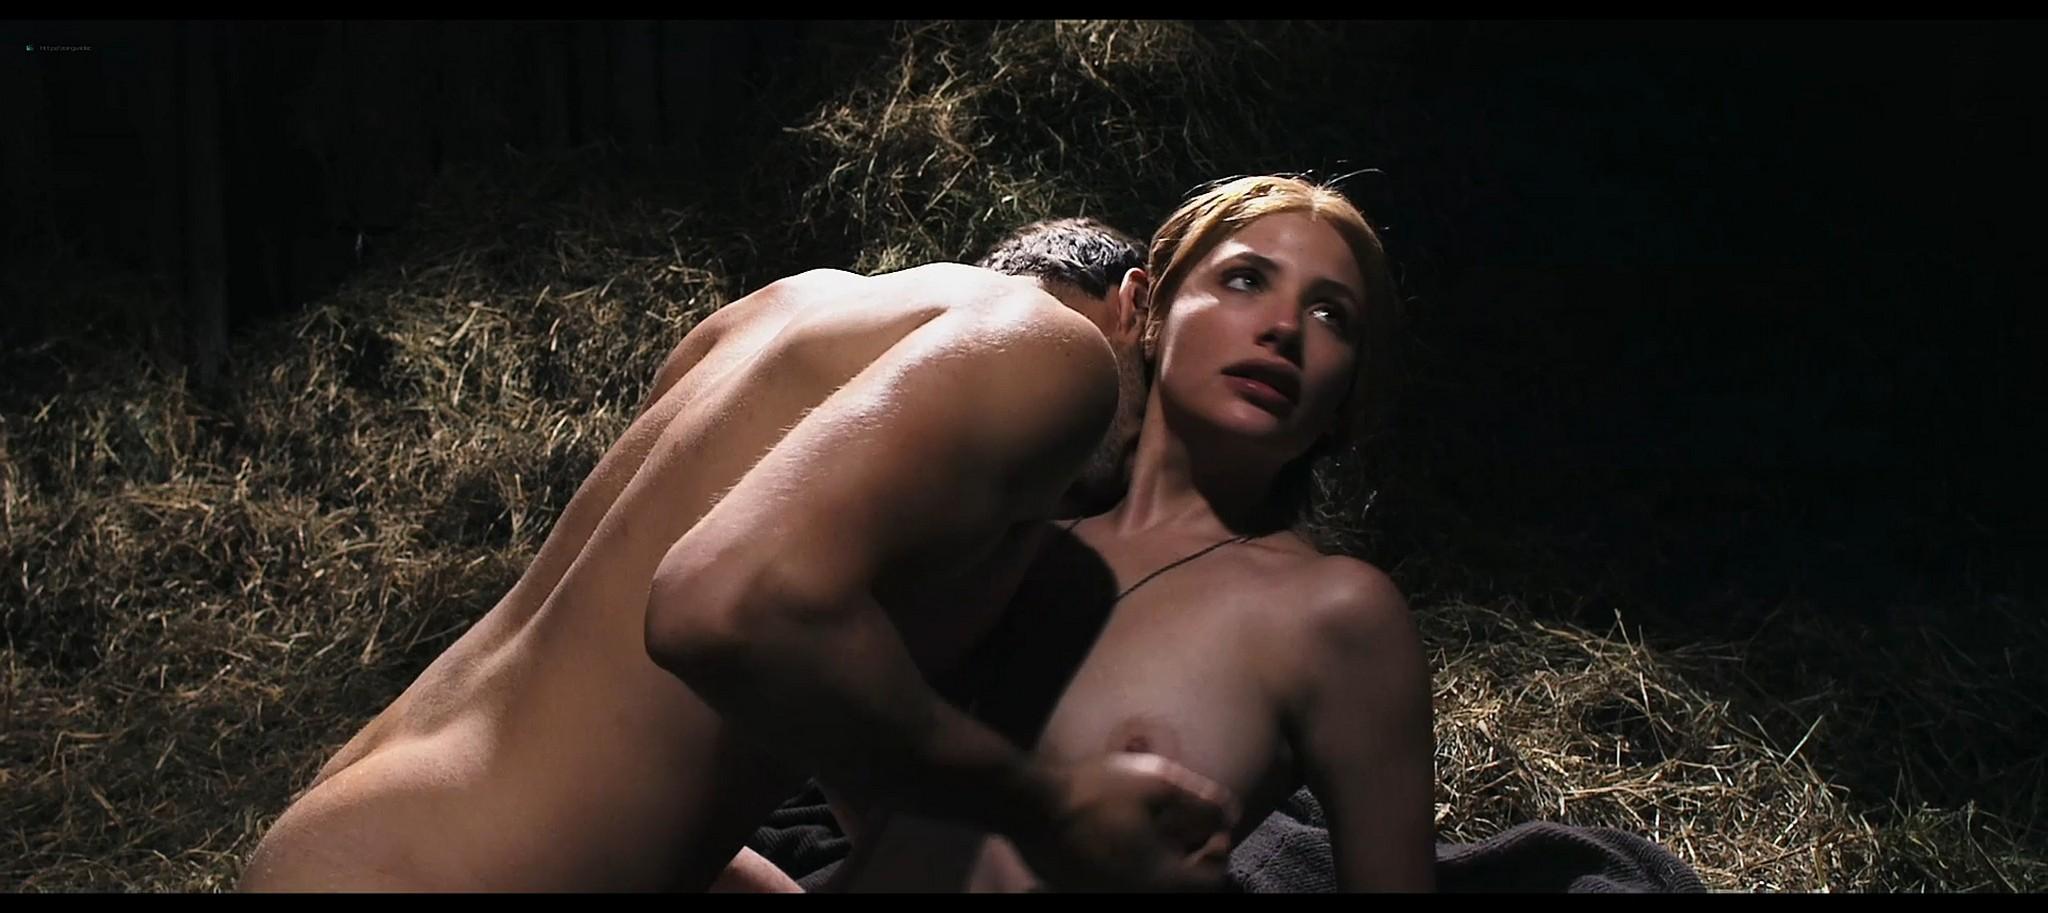 Asia Argento nude and Miriam Giovanelli nude in Darios Argento Dracula 3d 2012 HD 1080p BluRay 3